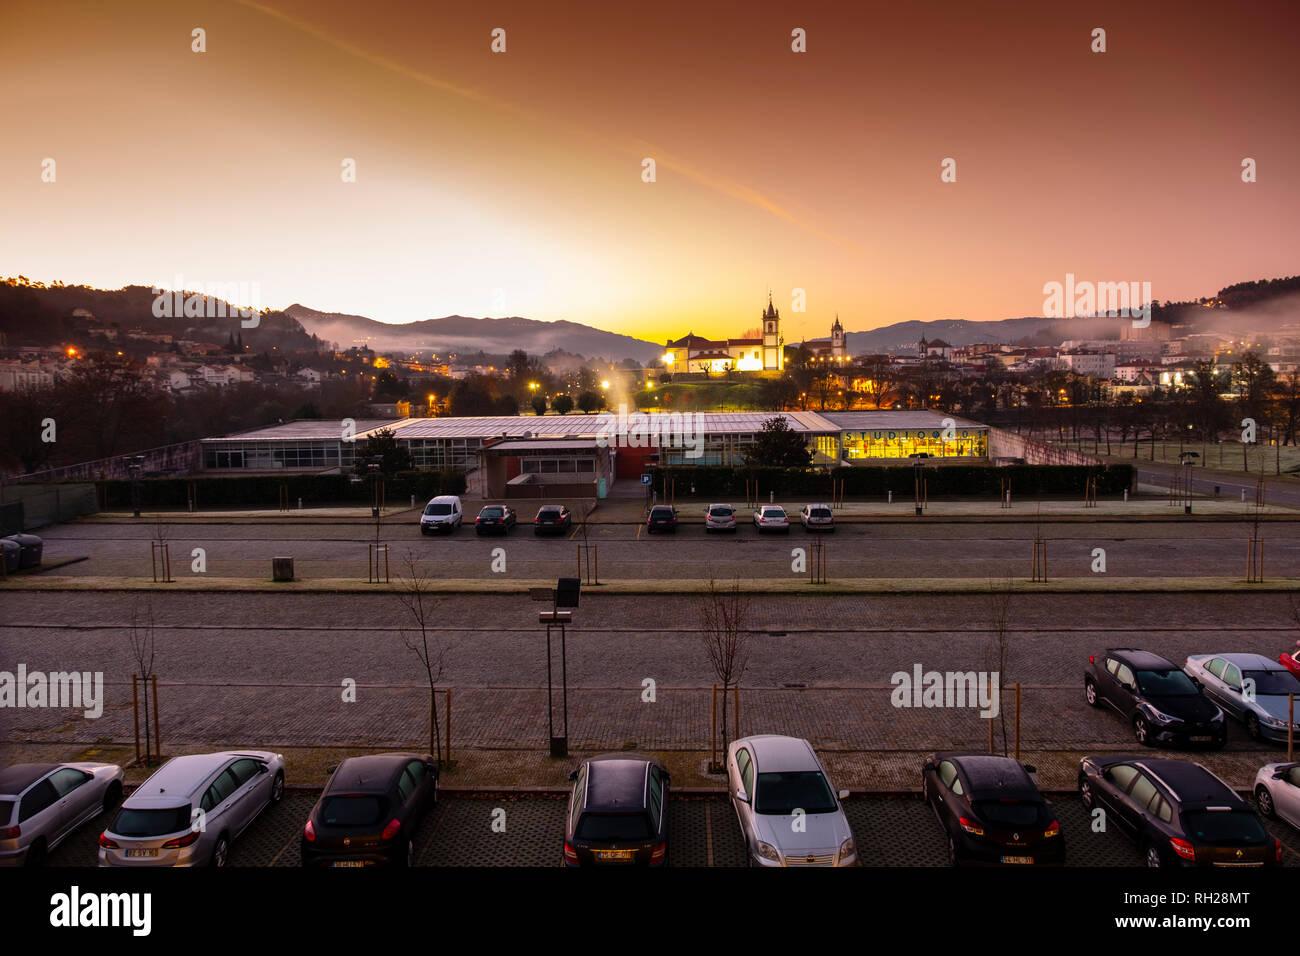 Panoramic view at sunrise, Village Arcos de Valdevez. Viana do Castelo, Alto Minho region. Northern Portugal, Europe - Stock Image